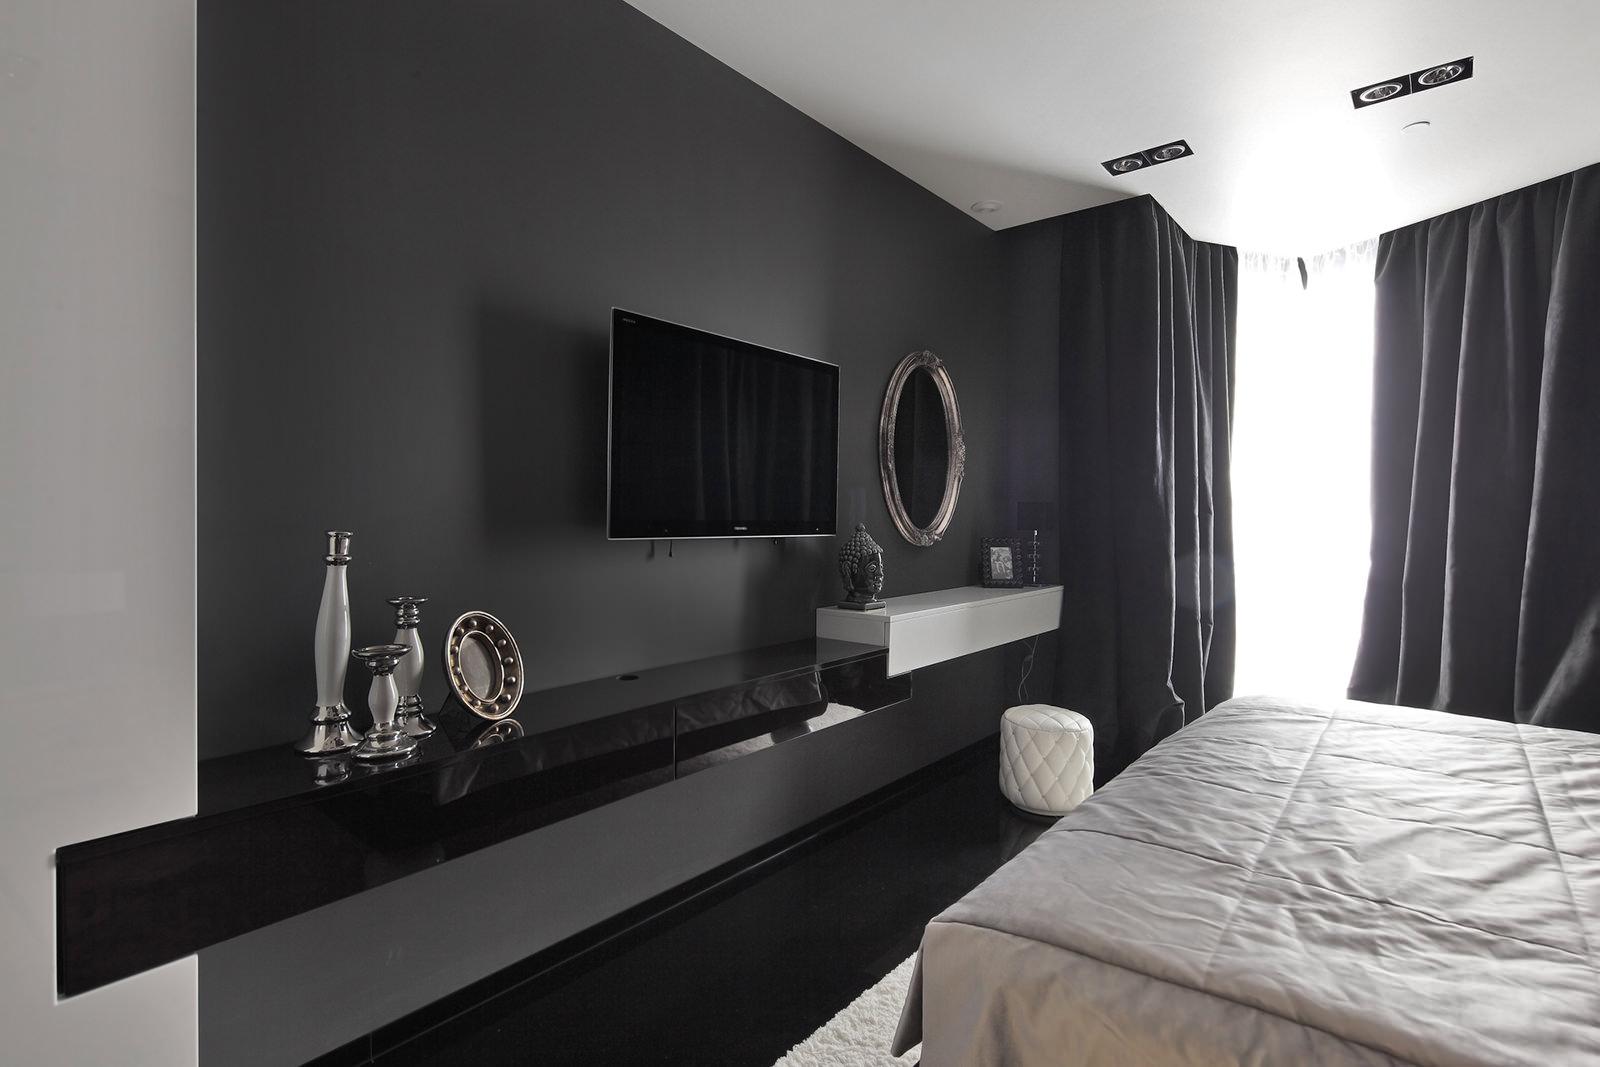 Черно-белая спальня в стиле готика